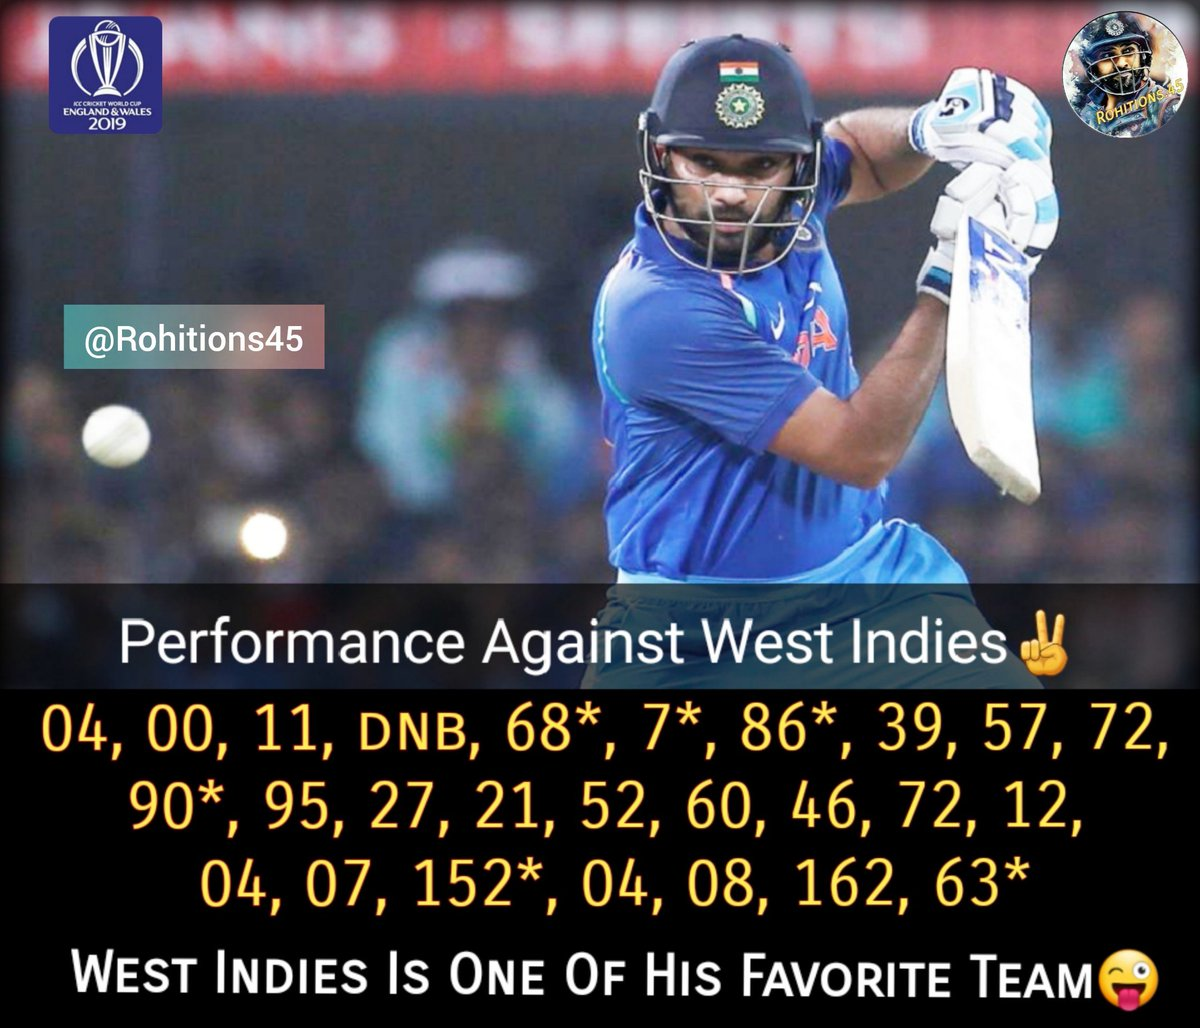 Hope He Will Continues His Dominance Over West Indies✌ @ImRo45 @ritssajdeh @BCCI @soumitraro45 #webelieve #rohitions45 #indvswi #indvwi #cricketmerijaan #mumbaiindians #cricket #mipaltan #rohitsharma #rohitsharma45  #worldcup #viratkohli #msdhoni #shikhardhawan